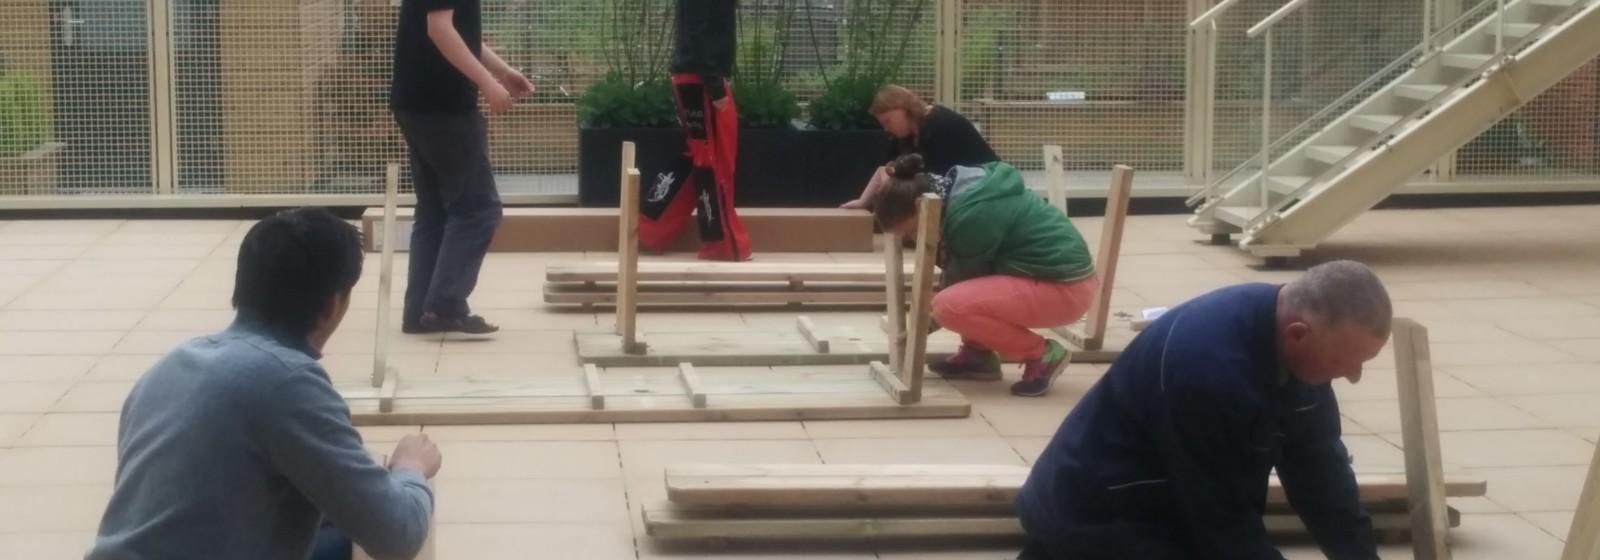 ouders en bewoners richten samen de binnentuin in